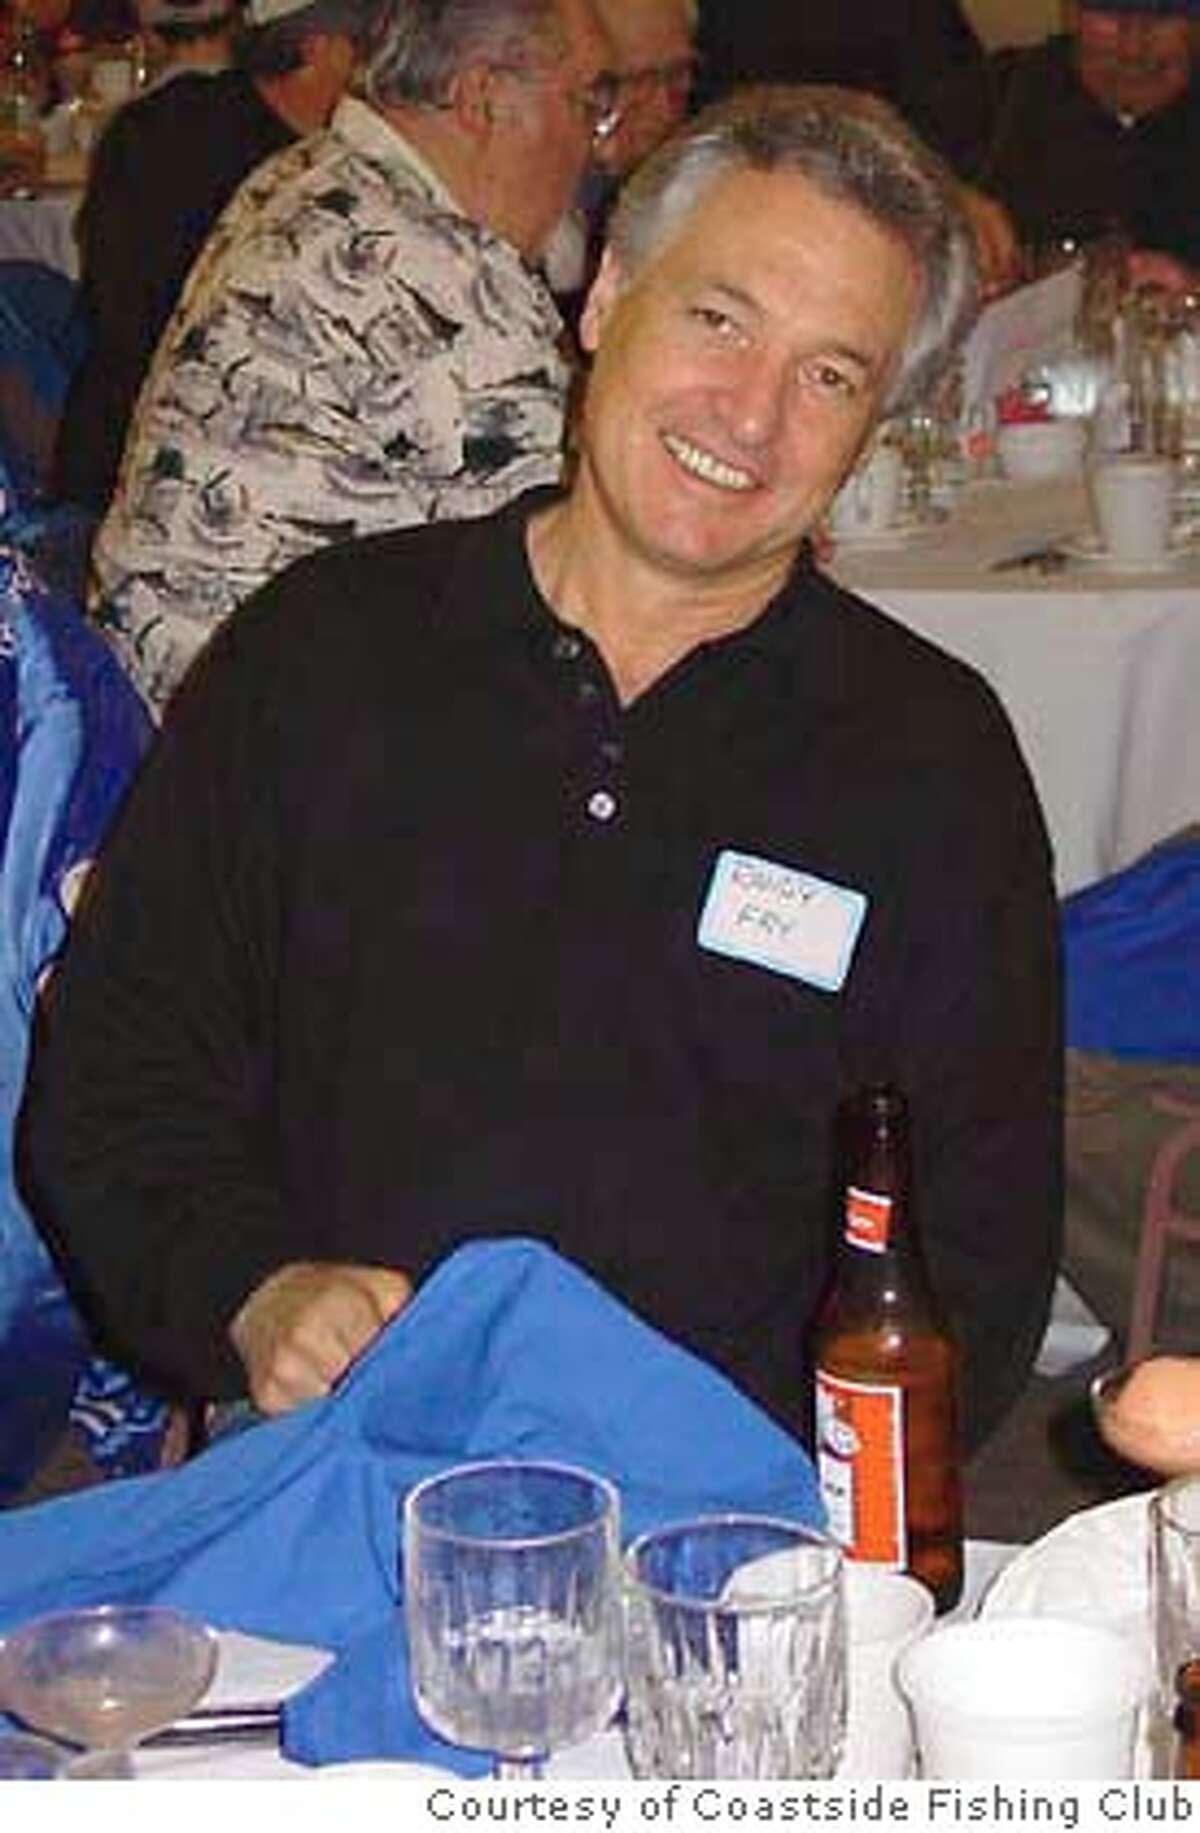 Randall Fry was killled by a shark on Mendocino Coast. Photo Courtesy of Coastside Fishing Club.